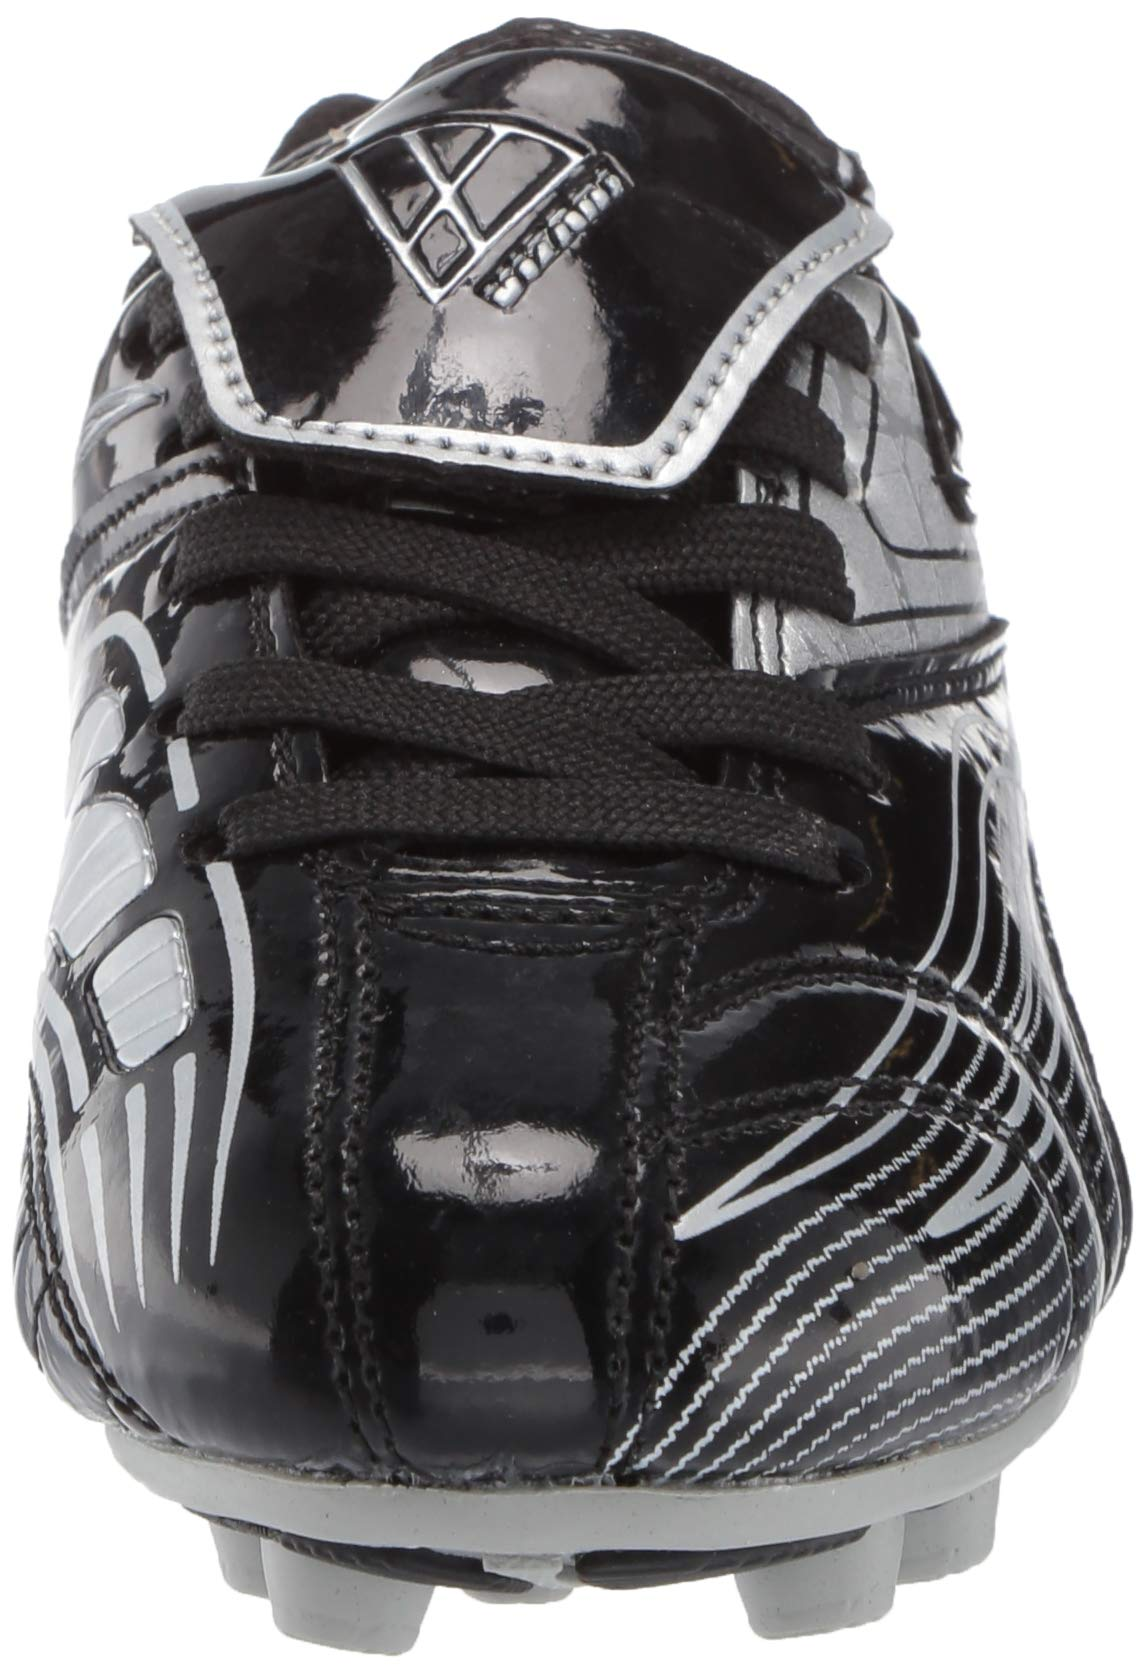 Vizari Striker FG Soccer Shoe (Toddler/Little Kid/Big Kid),Black/Silver,10 M US Toddler by Vizari (Image #4)